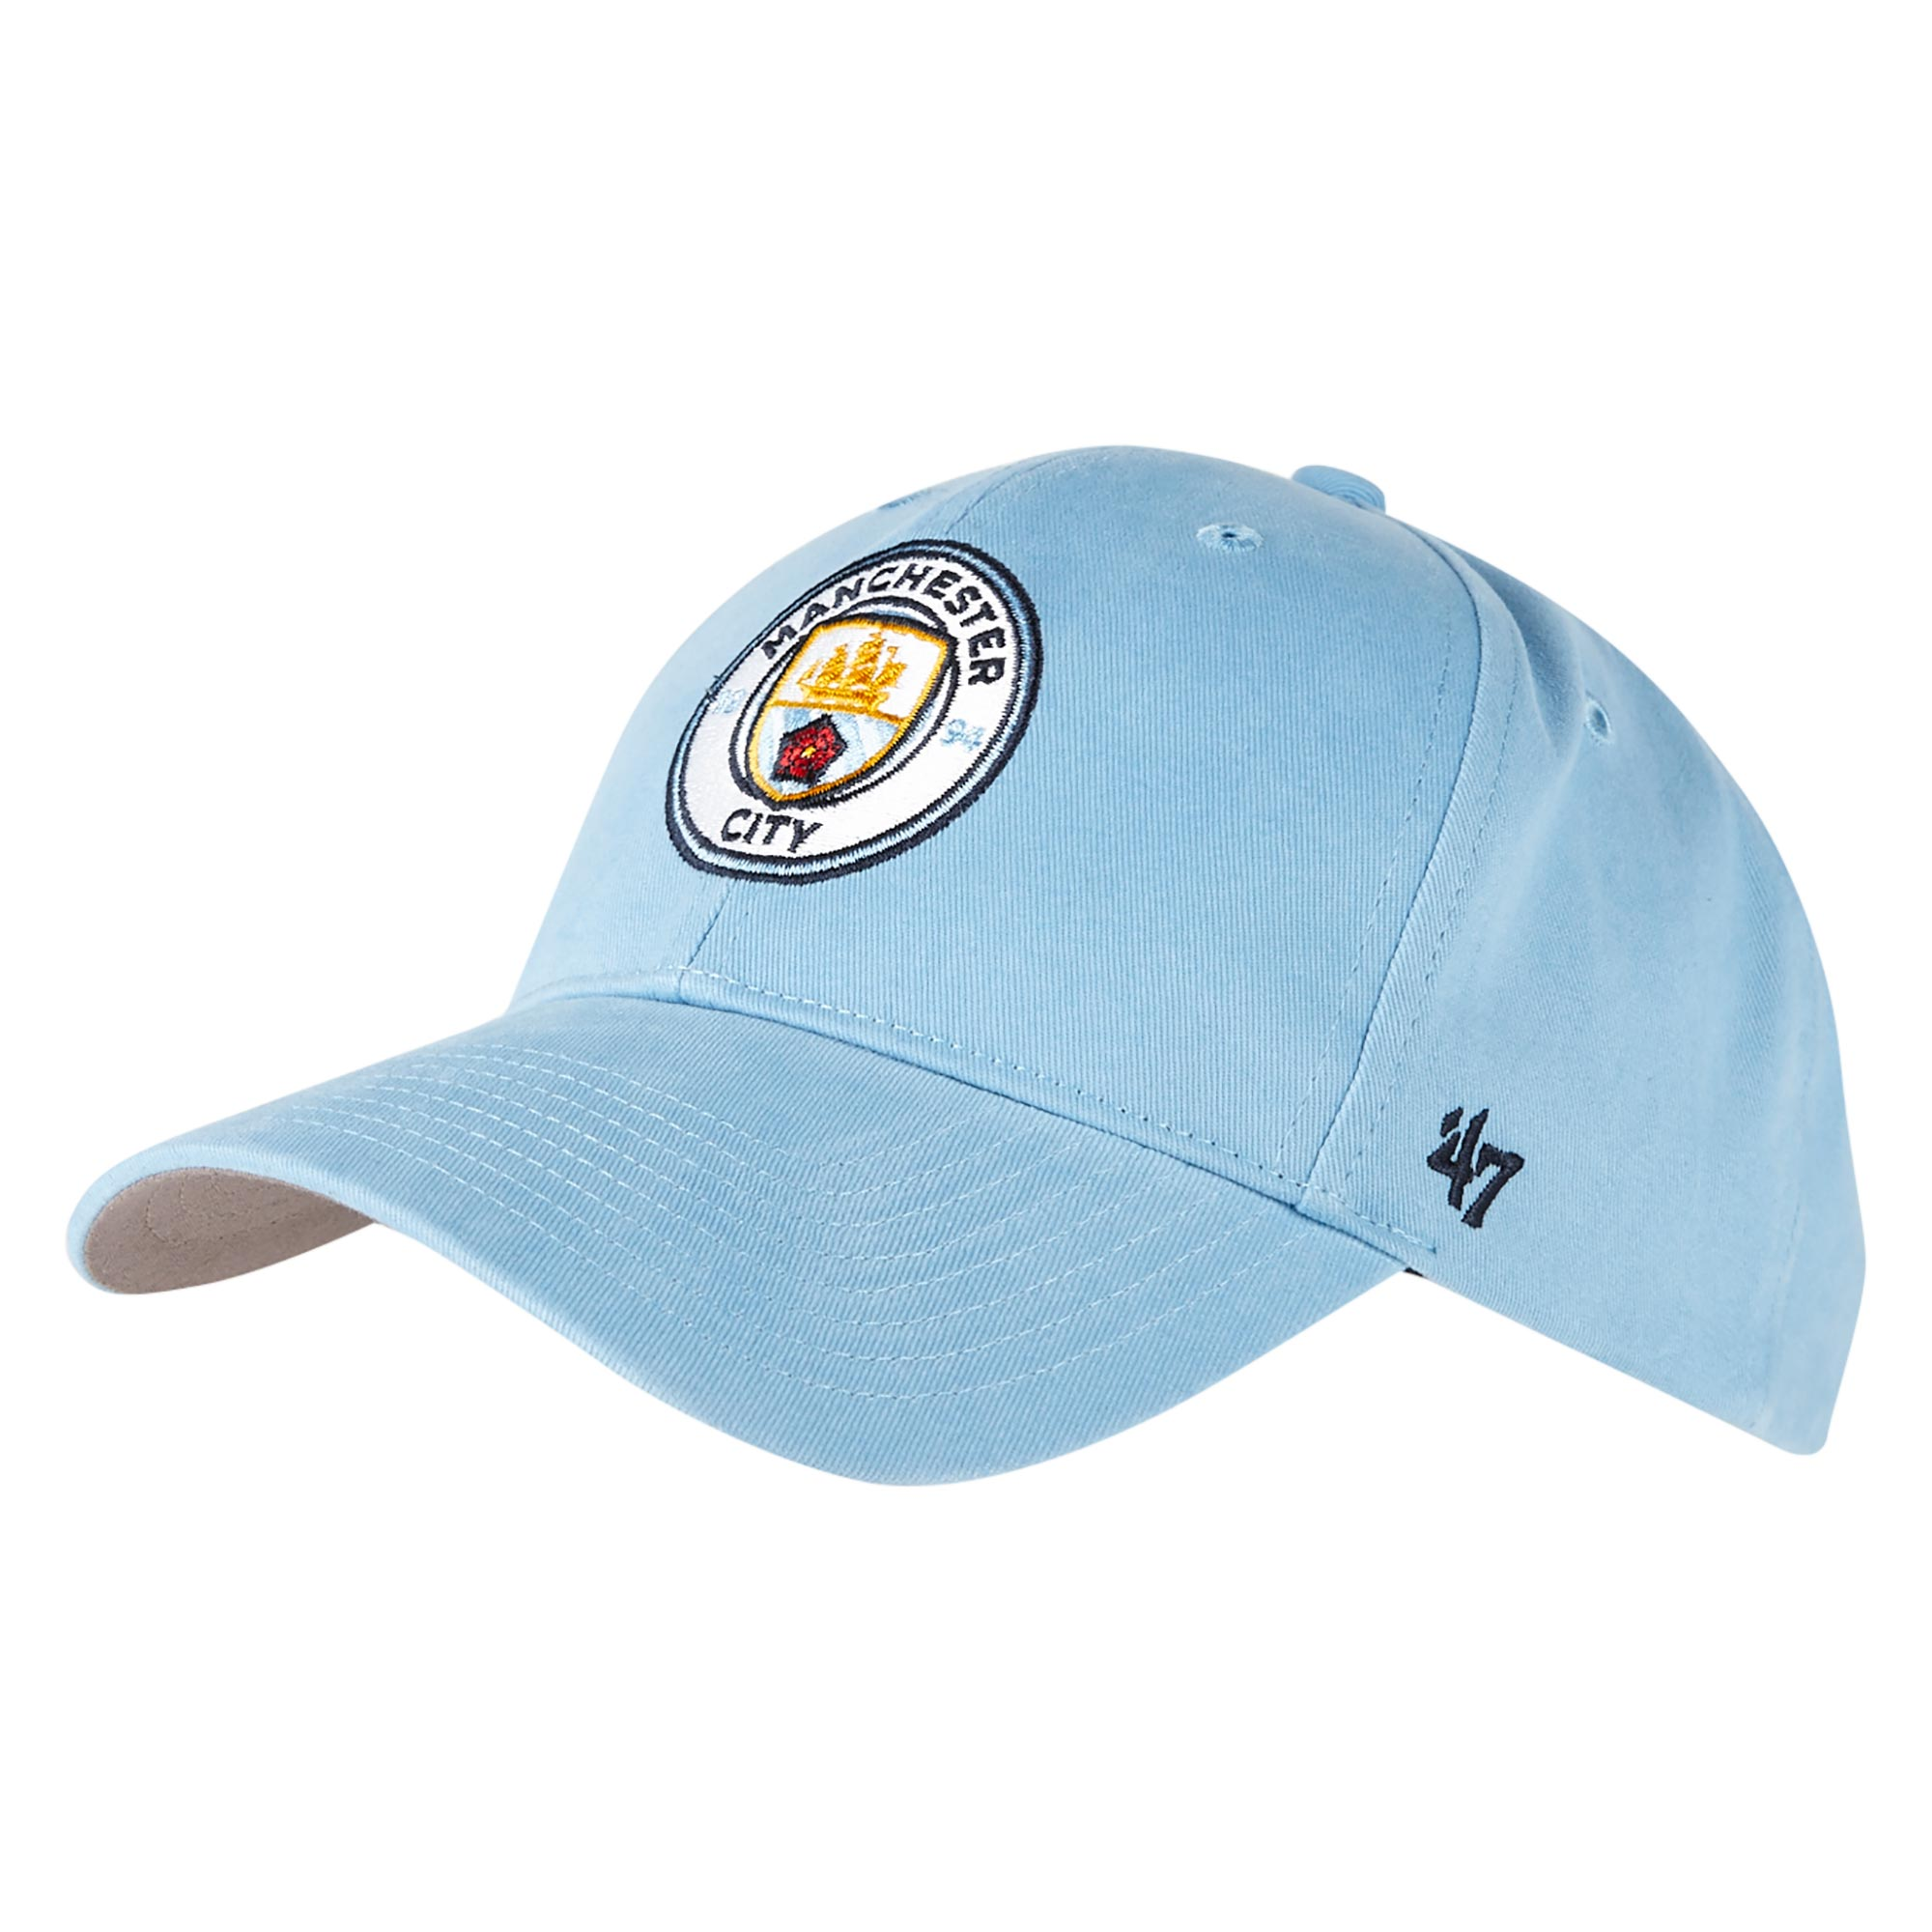 Manchester City 47 MVP Cap - Sky - Junior